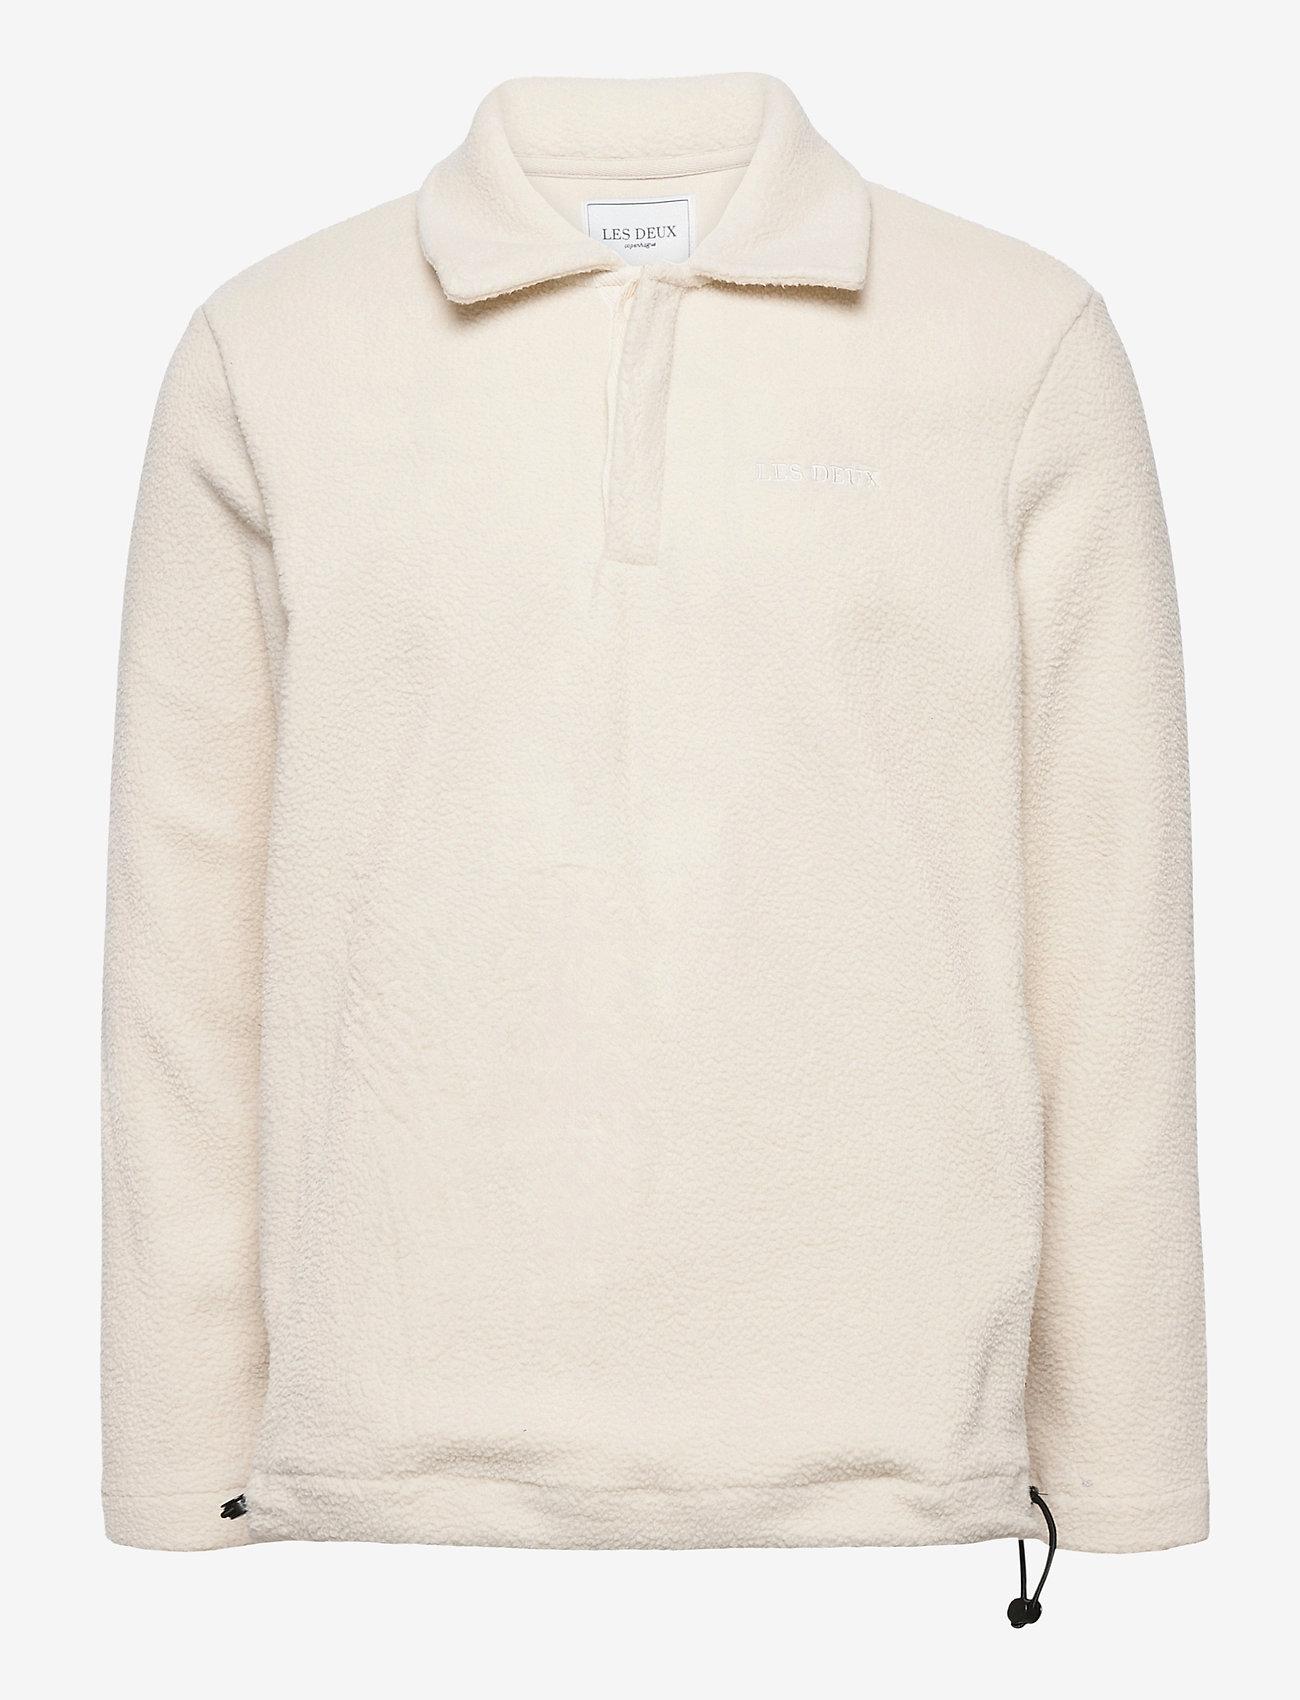 Les Deux - Dallas Fleece Rugby Sweatshirt - basic-sweatshirts - off white - 0